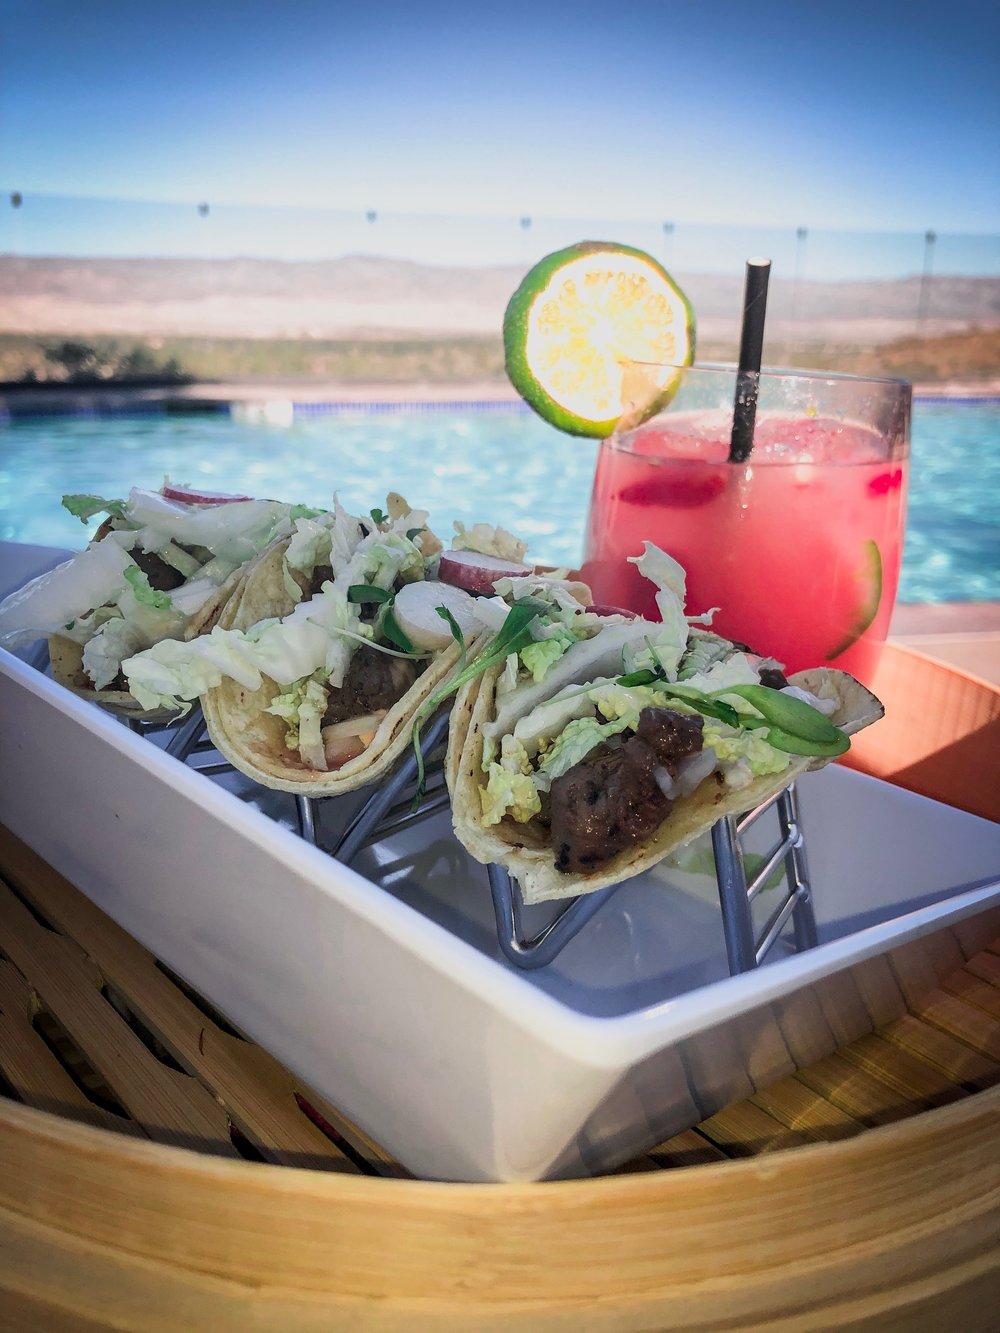 Poolside Carne Asada Tacos and Spicy Strawberry Margarita